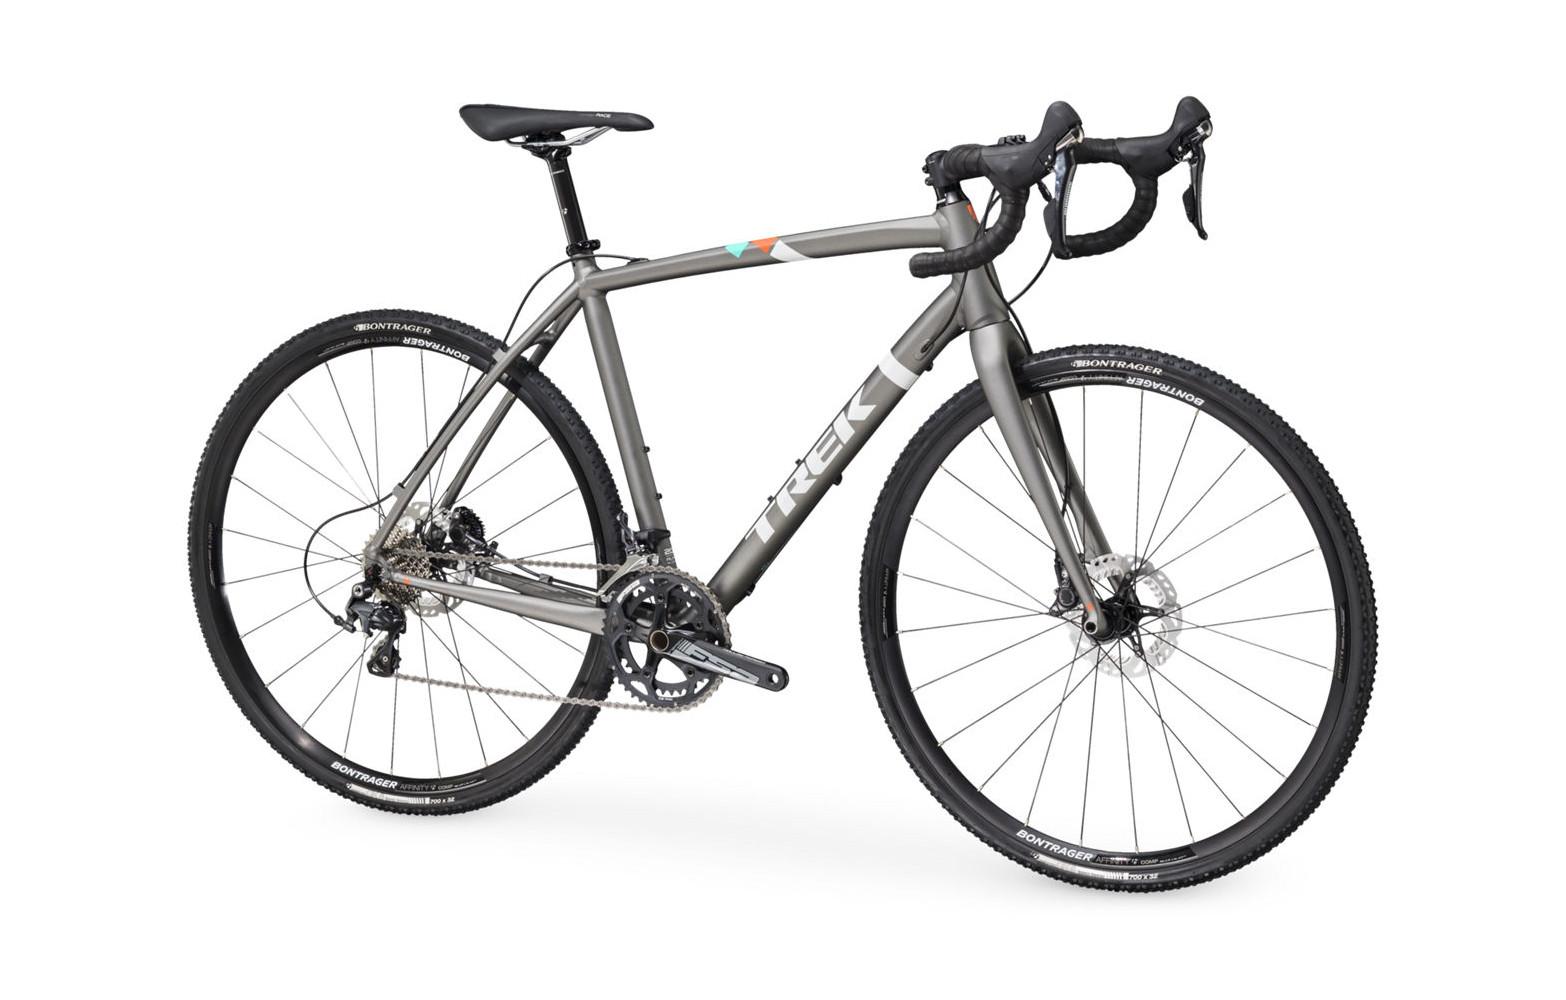 trek cyclo cross full bike crockett 9 disc grey. Black Bedroom Furniture Sets. Home Design Ideas